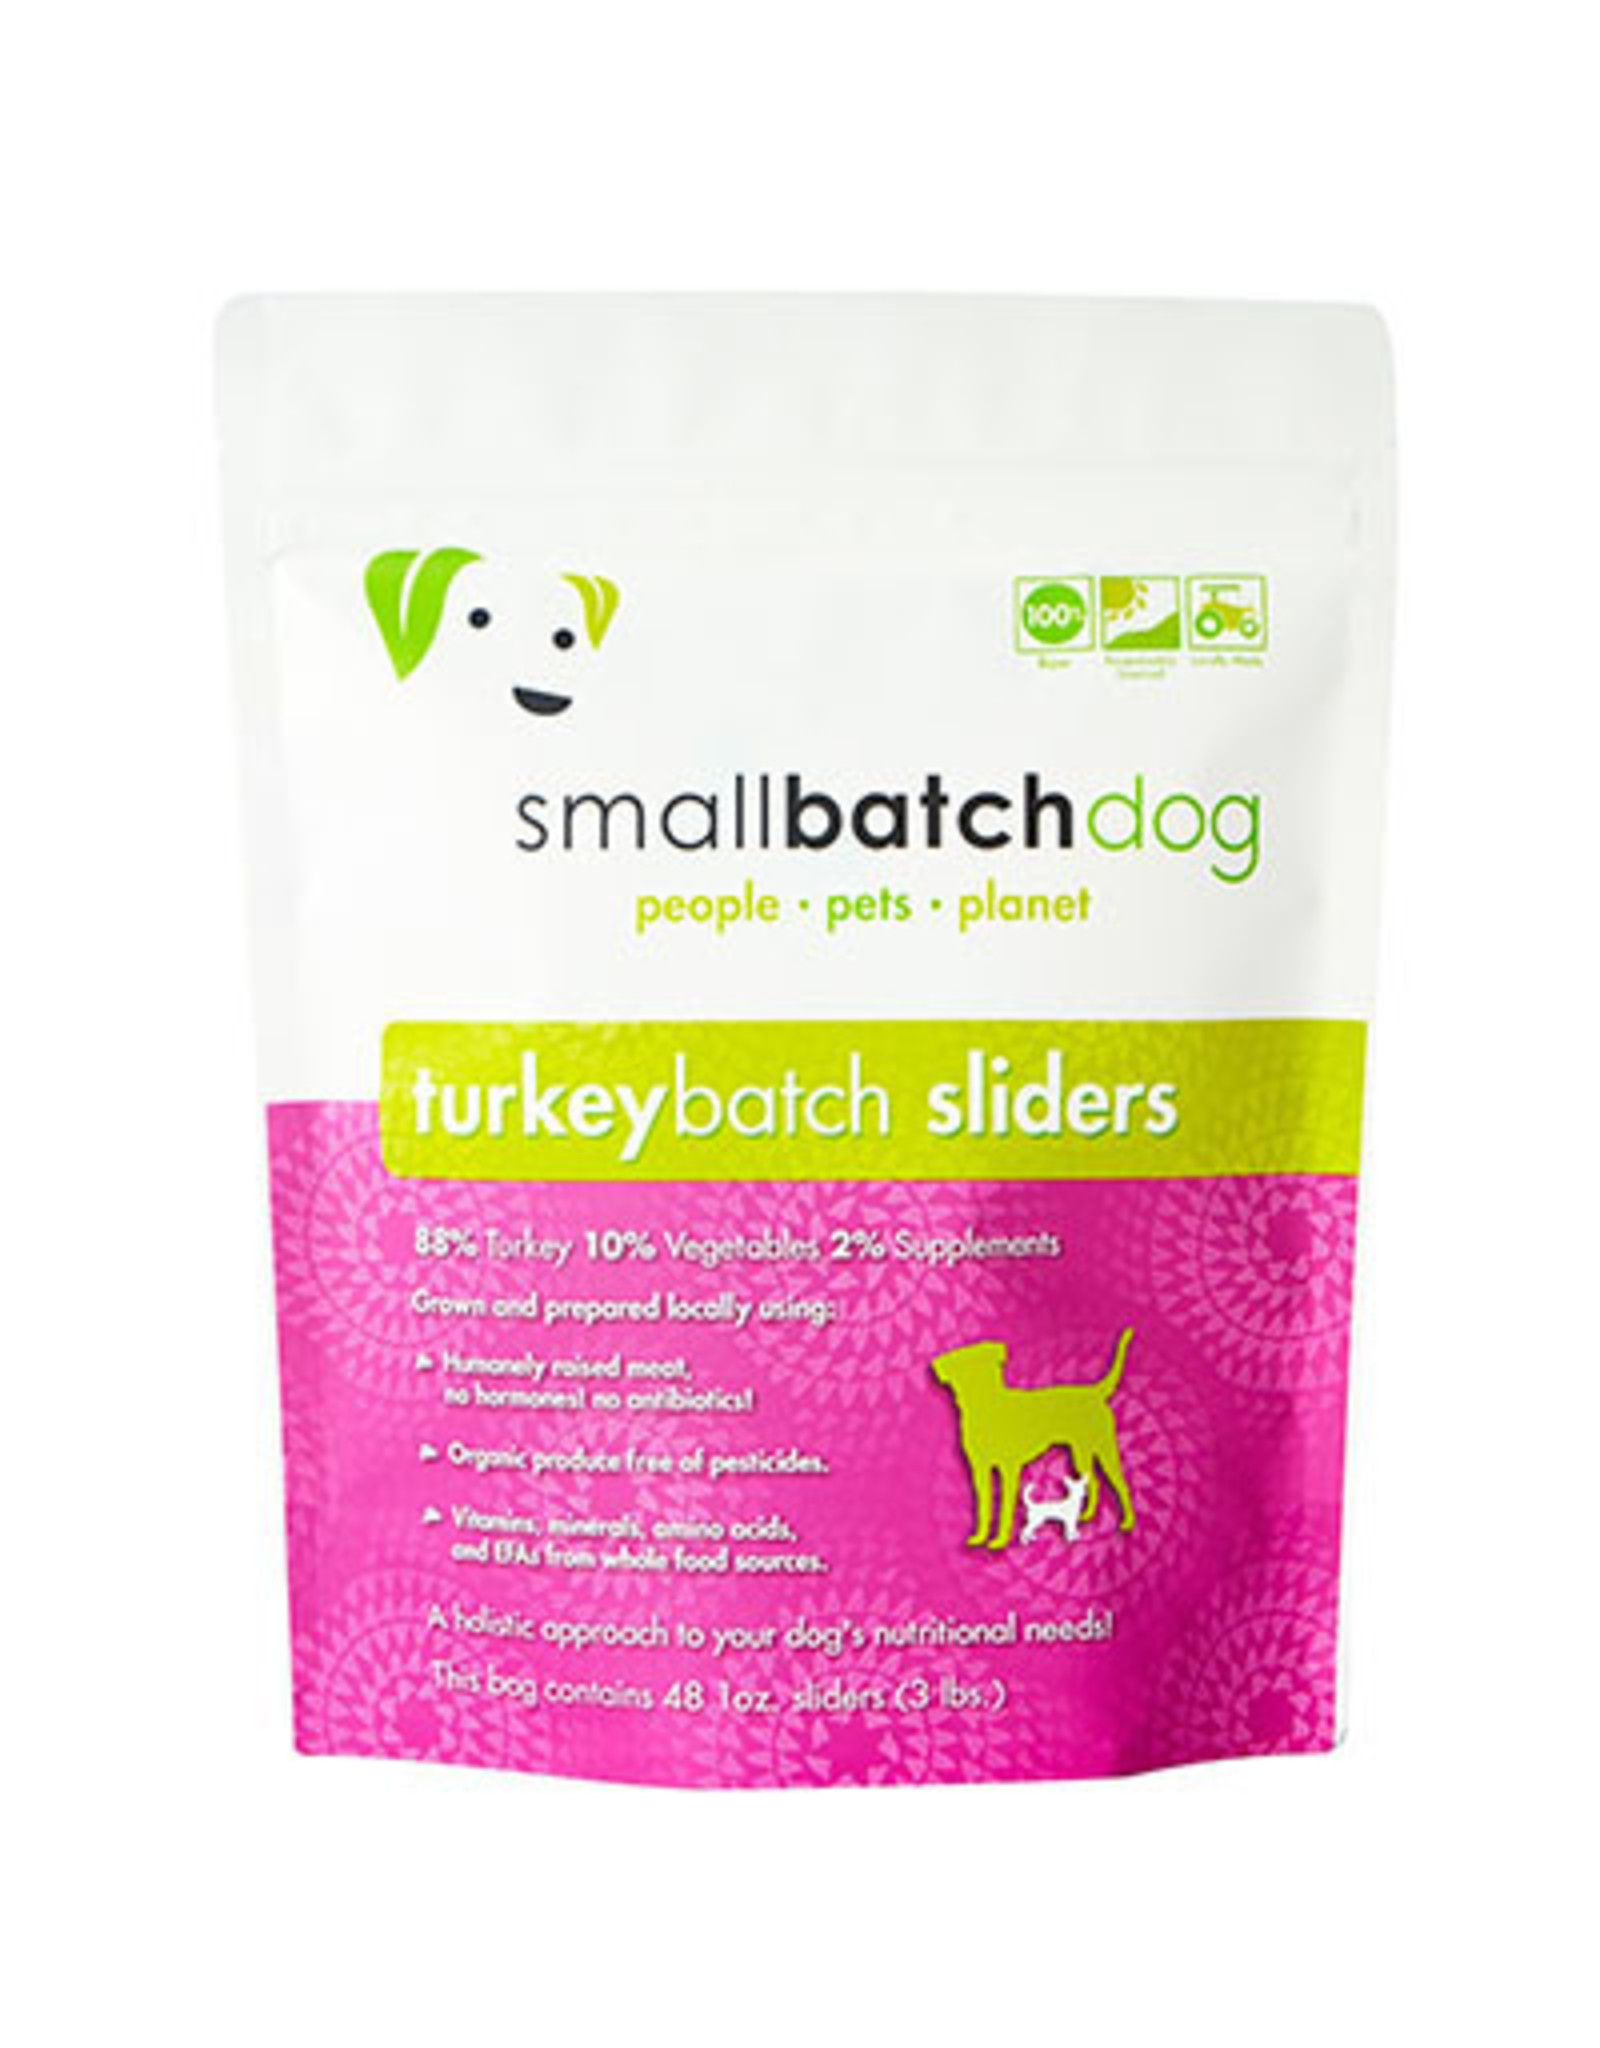 Smallbatch SMALLBATCH DOG FROZEN RAW TURKEY BATCH